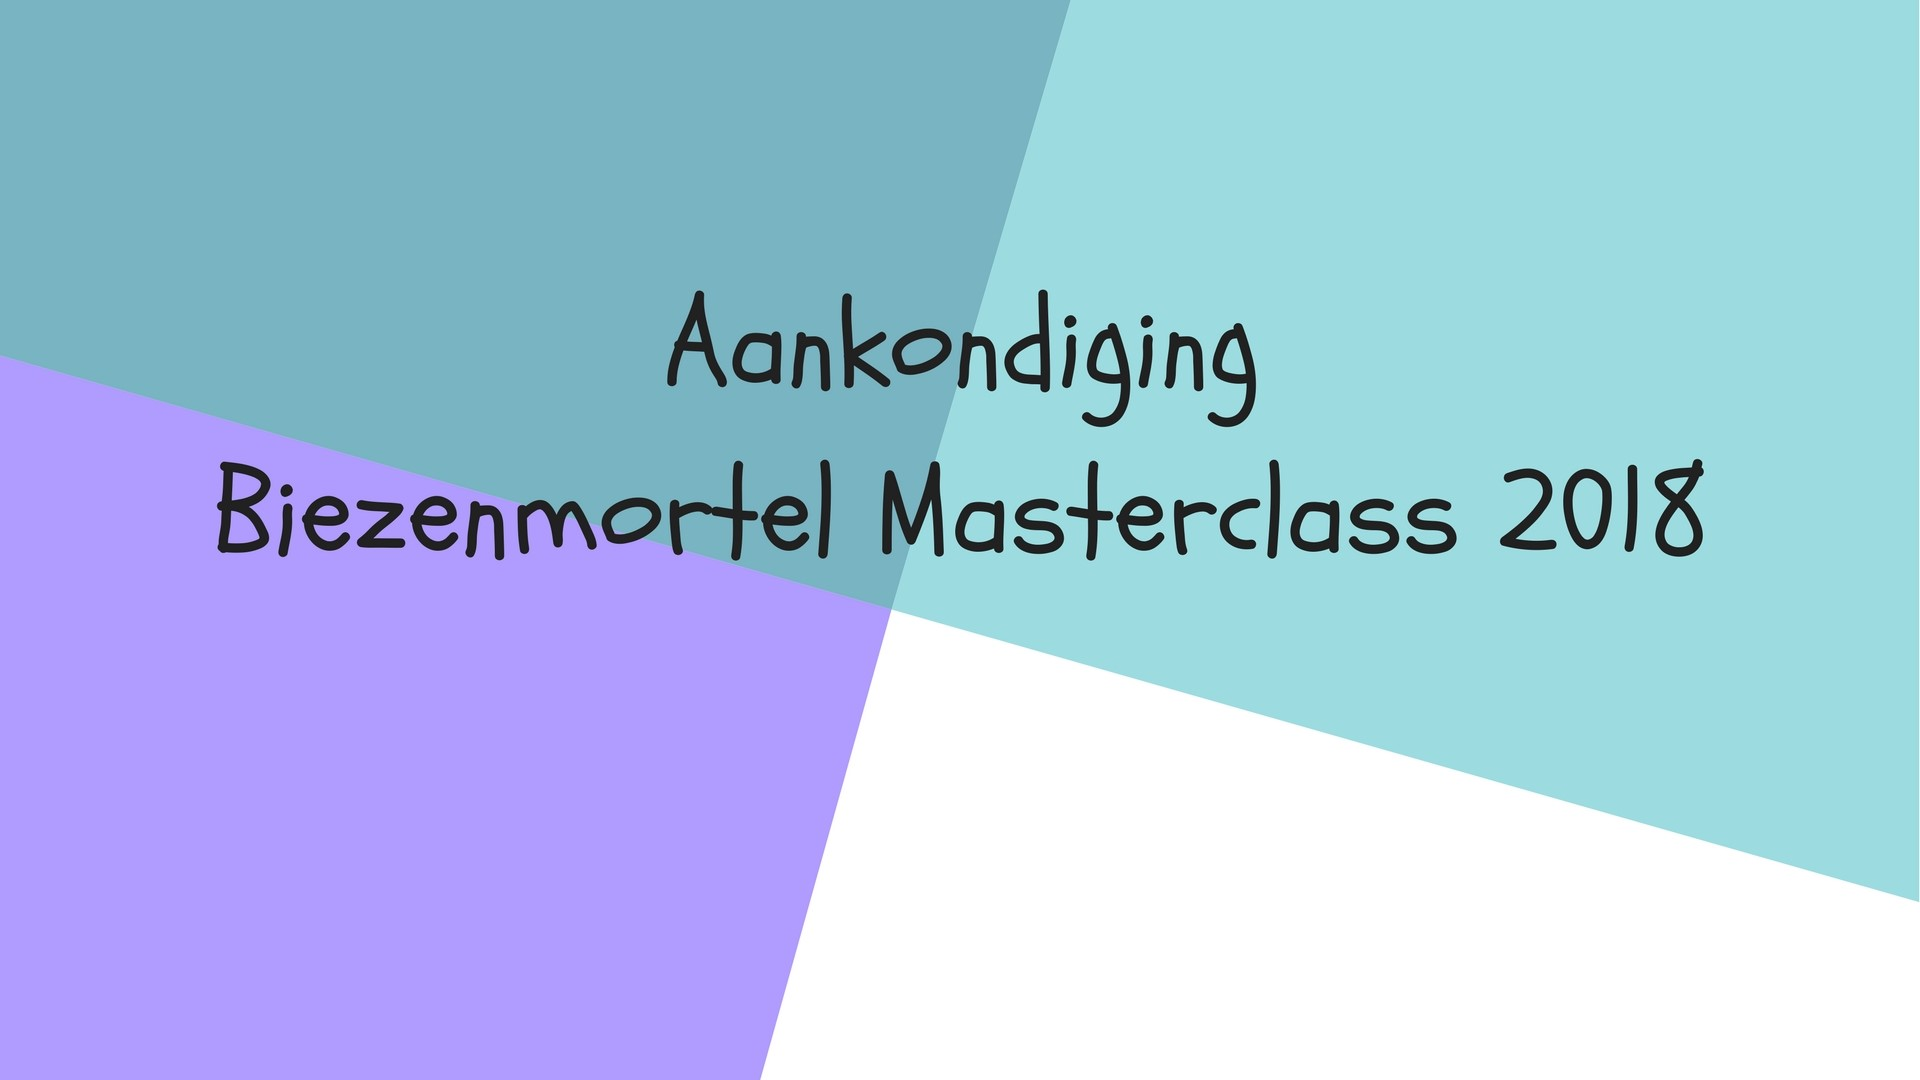 Biezenmortel Masterclass 2018